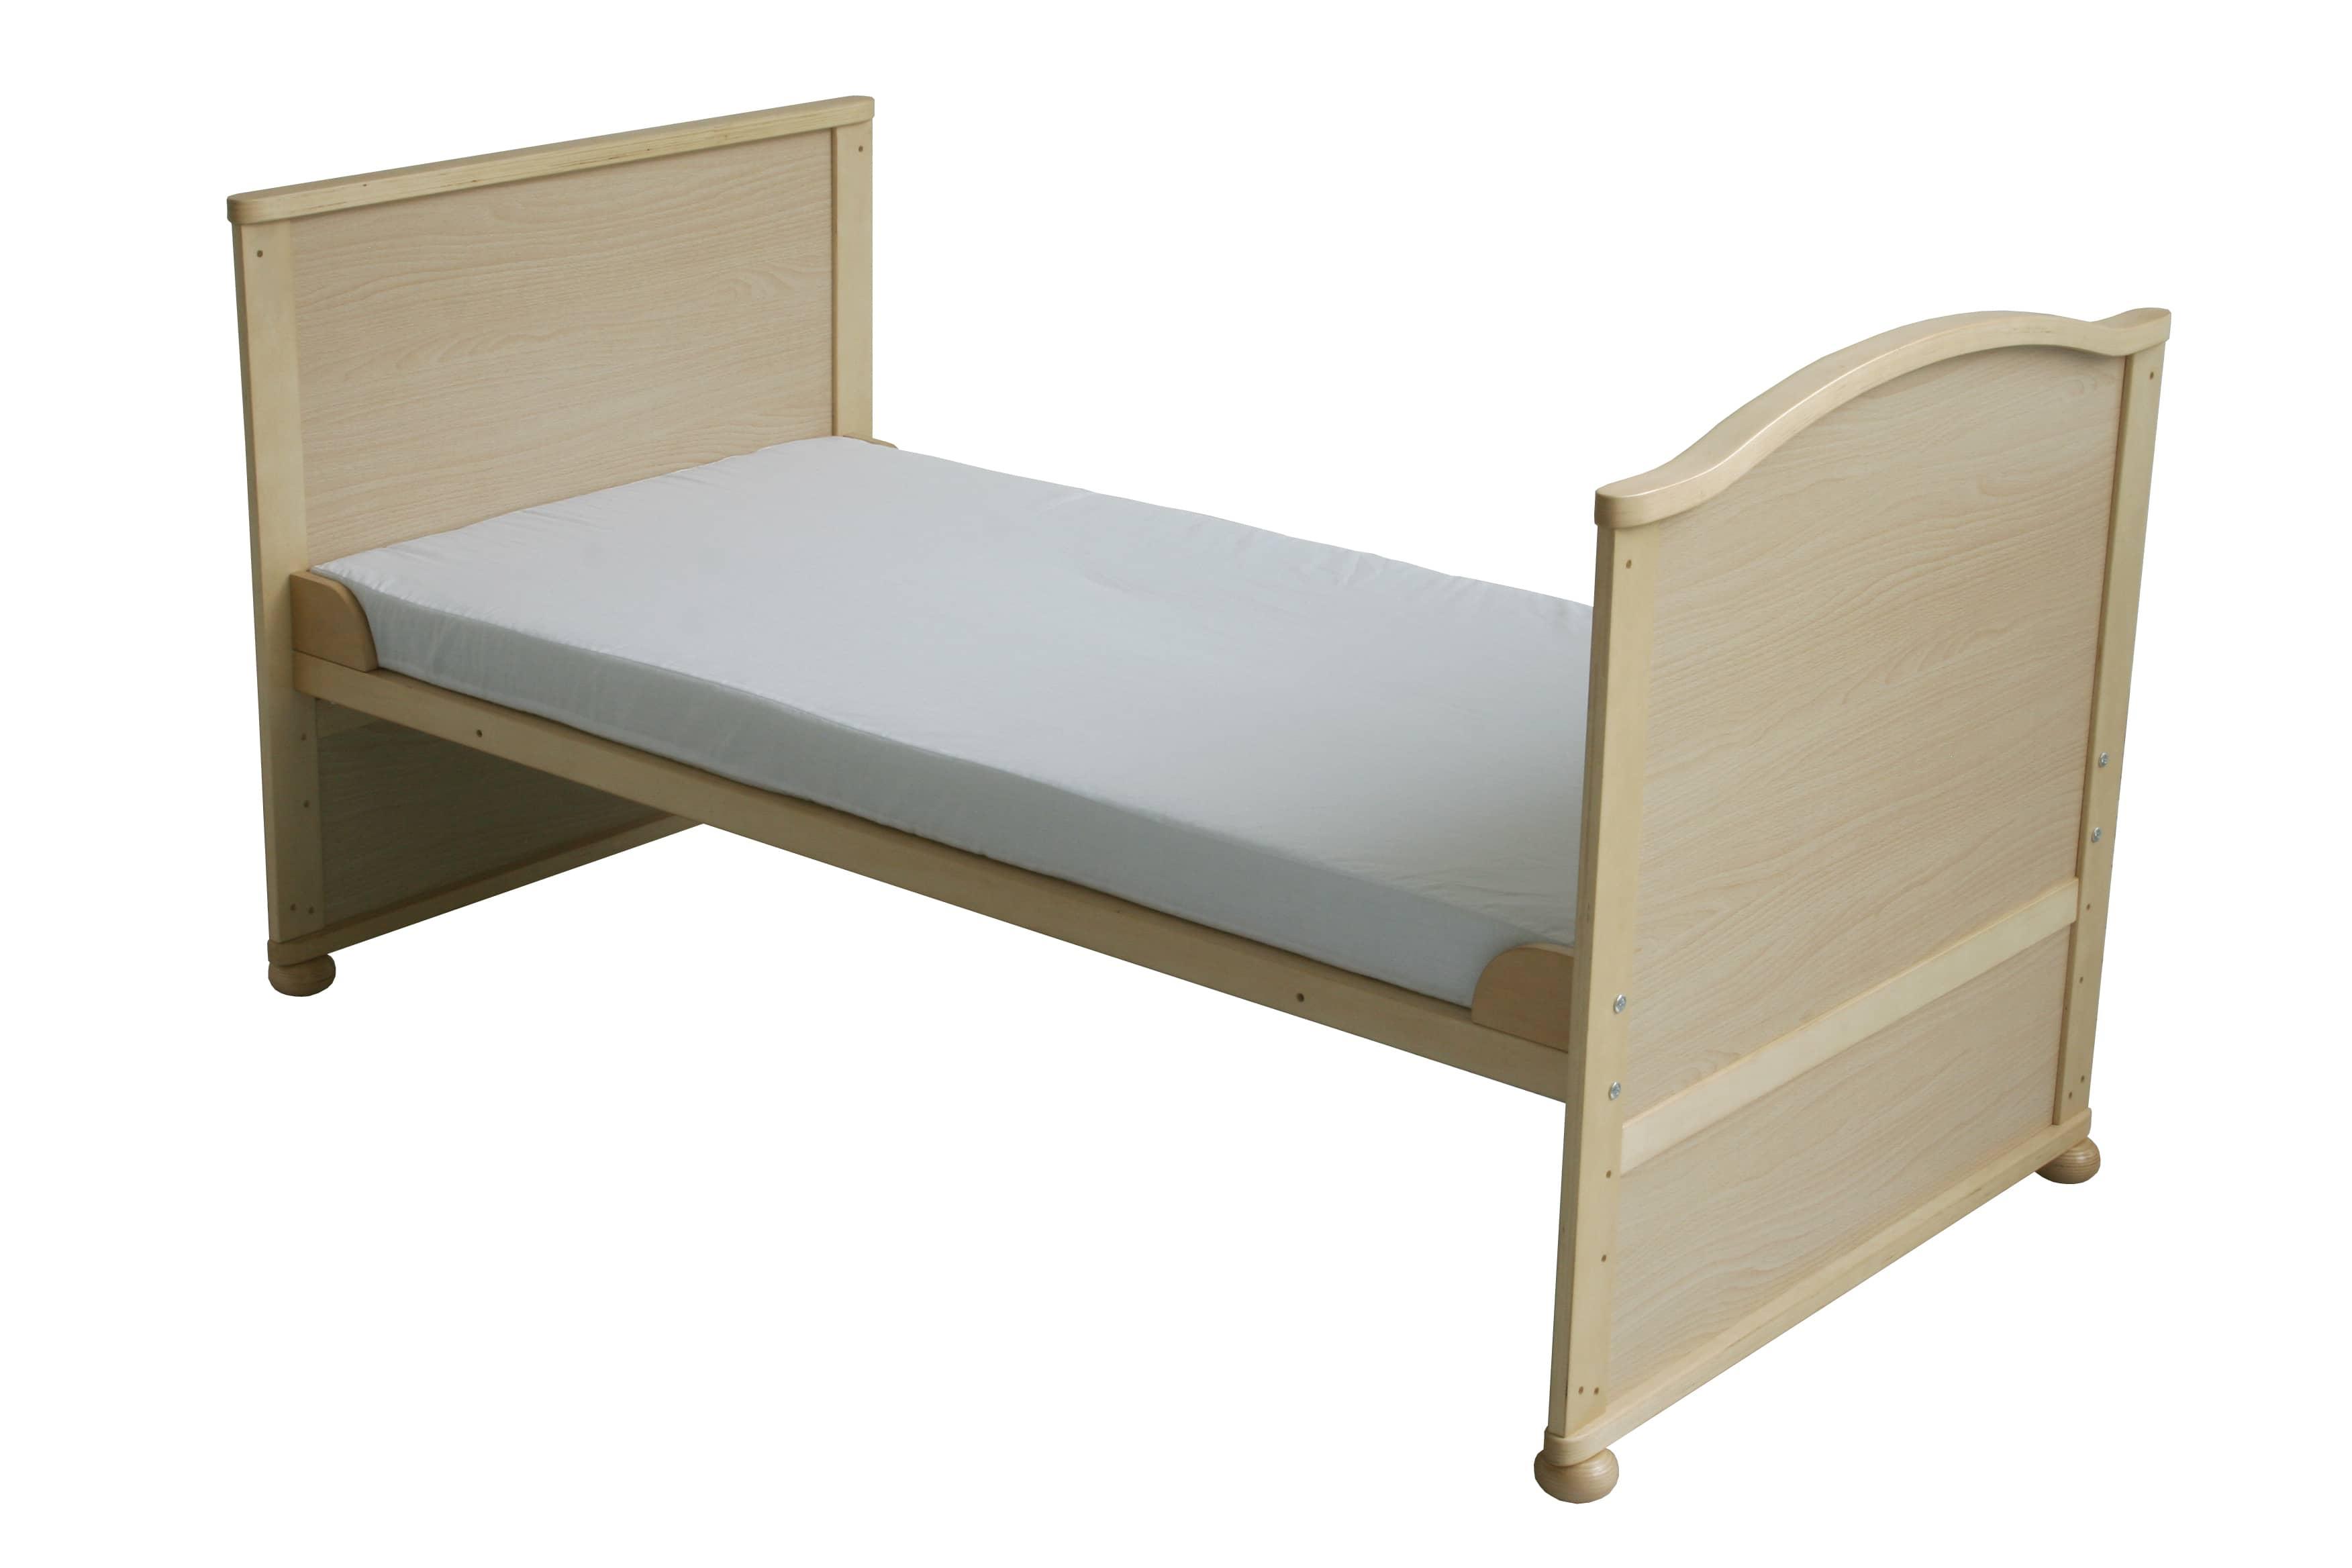 roba kombi kinderbett lukas naturfarben 70x140cm. Black Bedroom Furniture Sets. Home Design Ideas